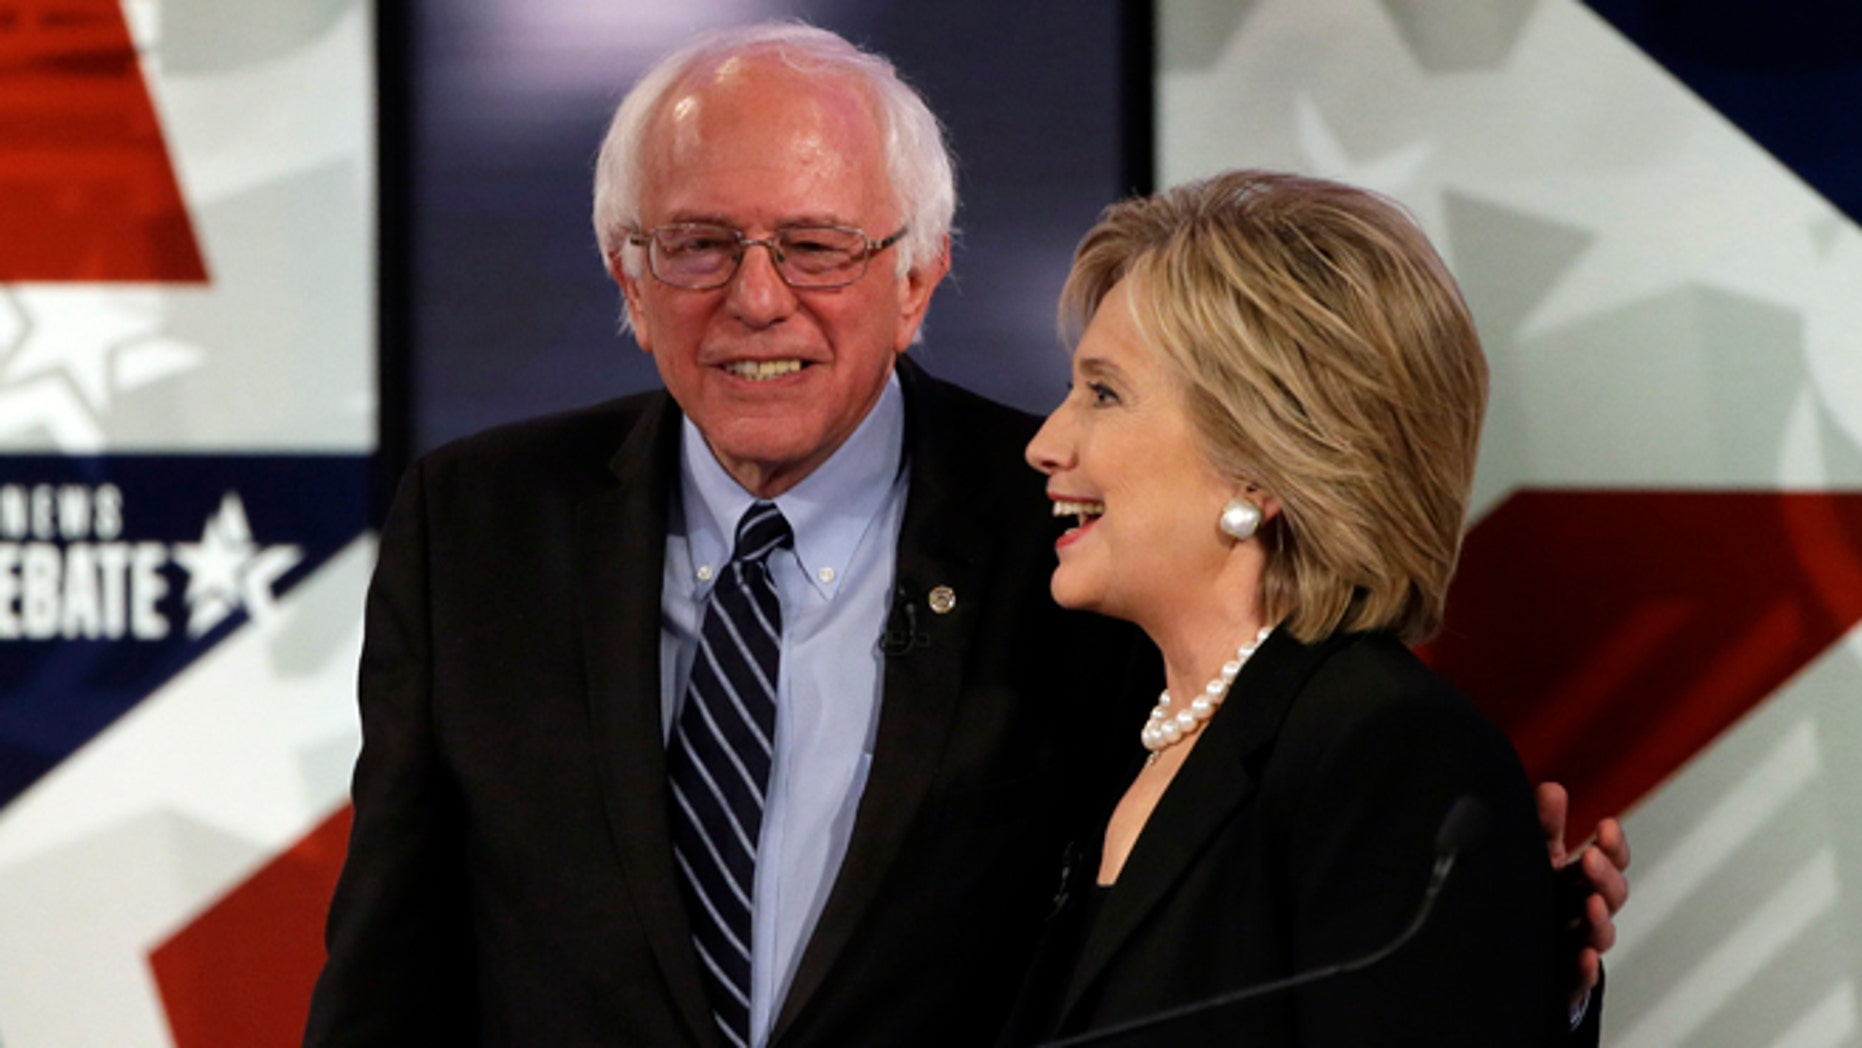 Nov. 14, 2015: Hillary Rodham Clinton, right, talks to Bernie Sanders after a Democratic presidential primary debate in Des Moines, Iowa.